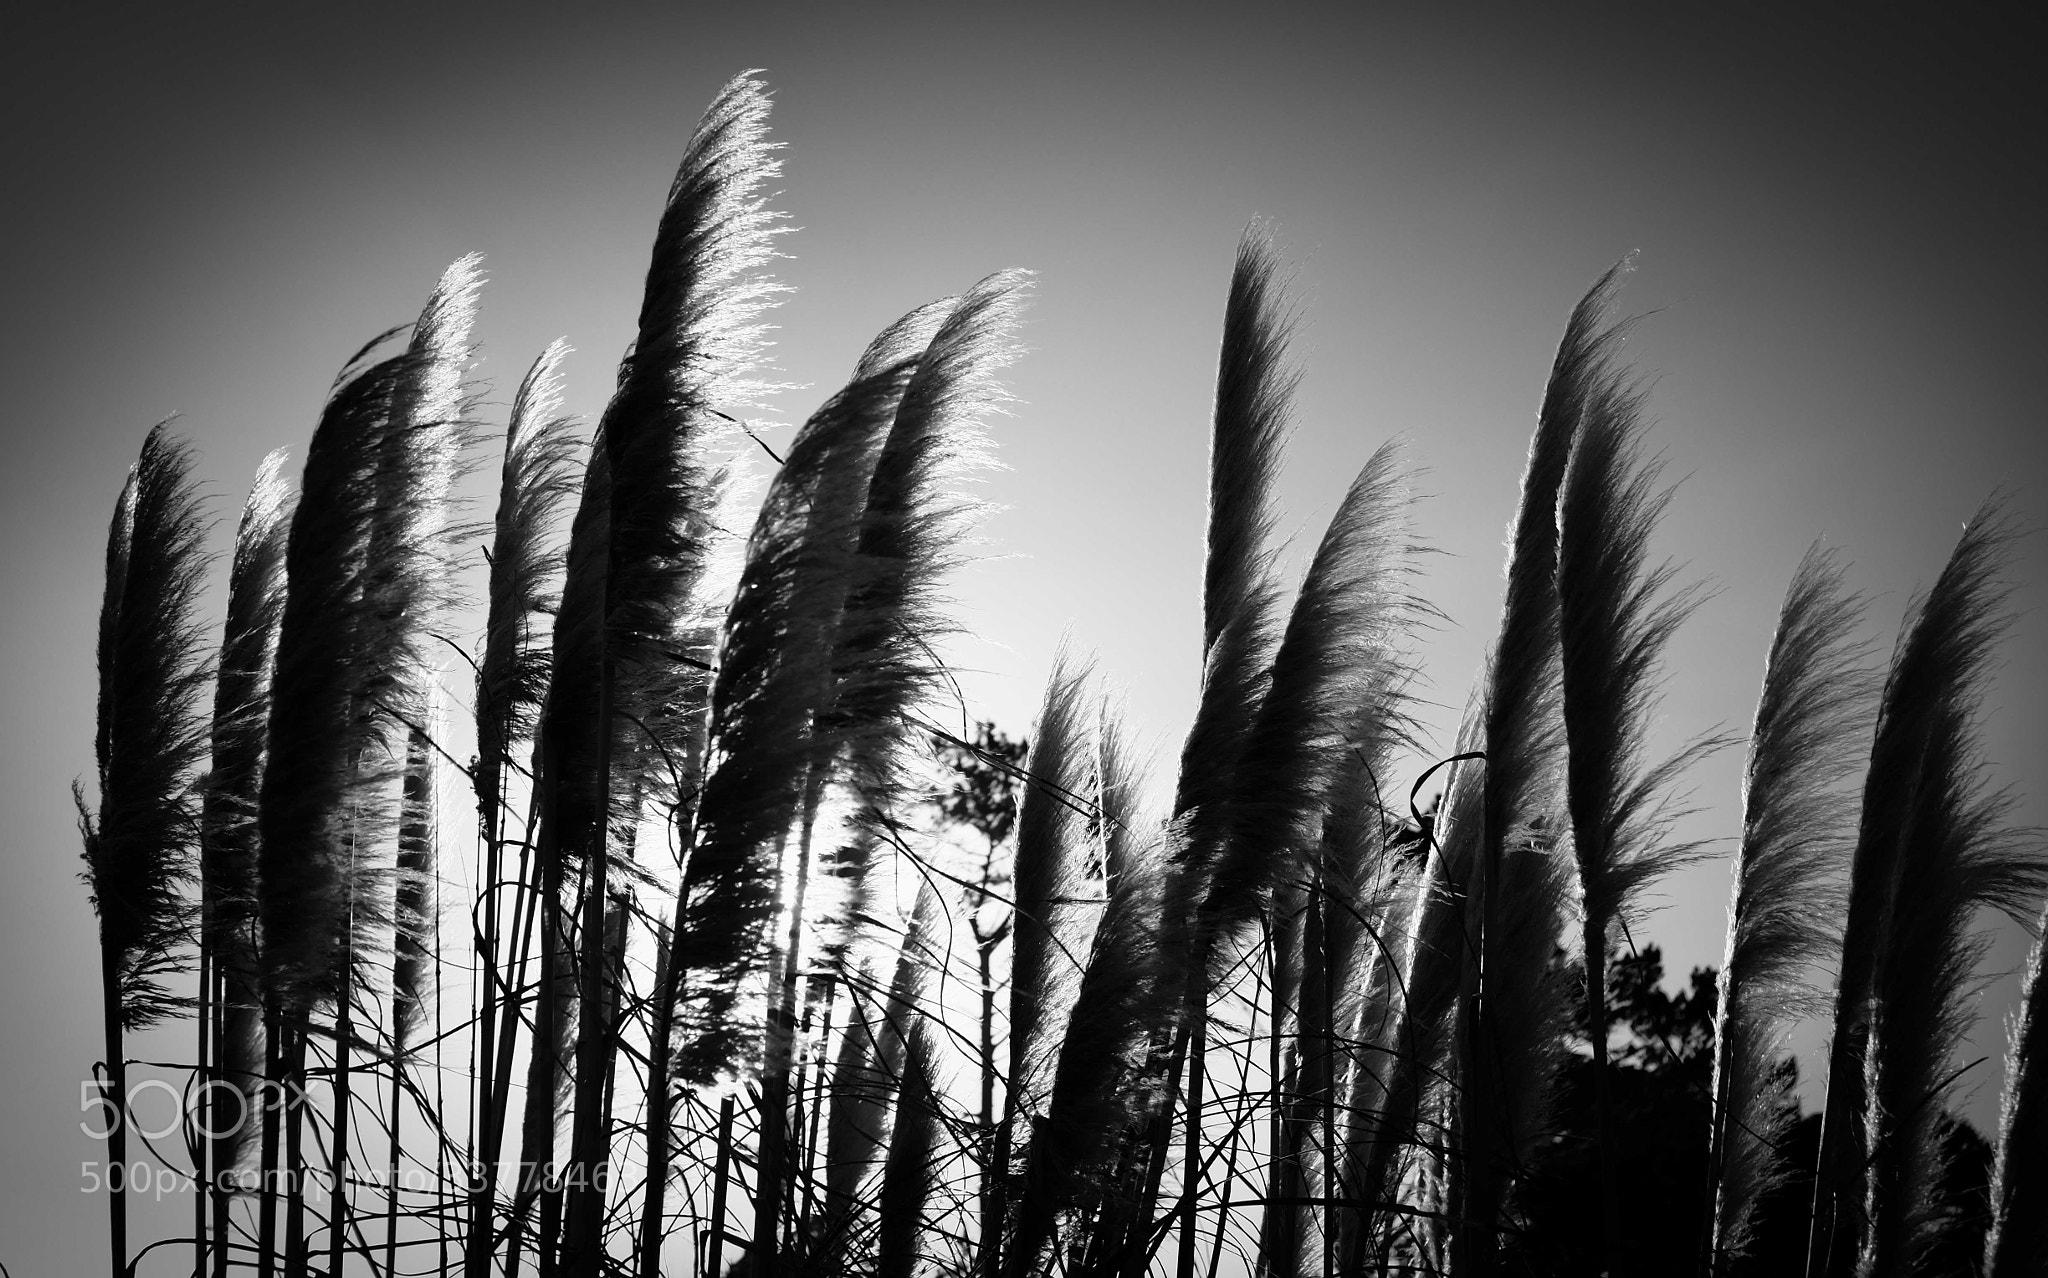 Photograph CutyCuty by Etienne de Beer on 500px